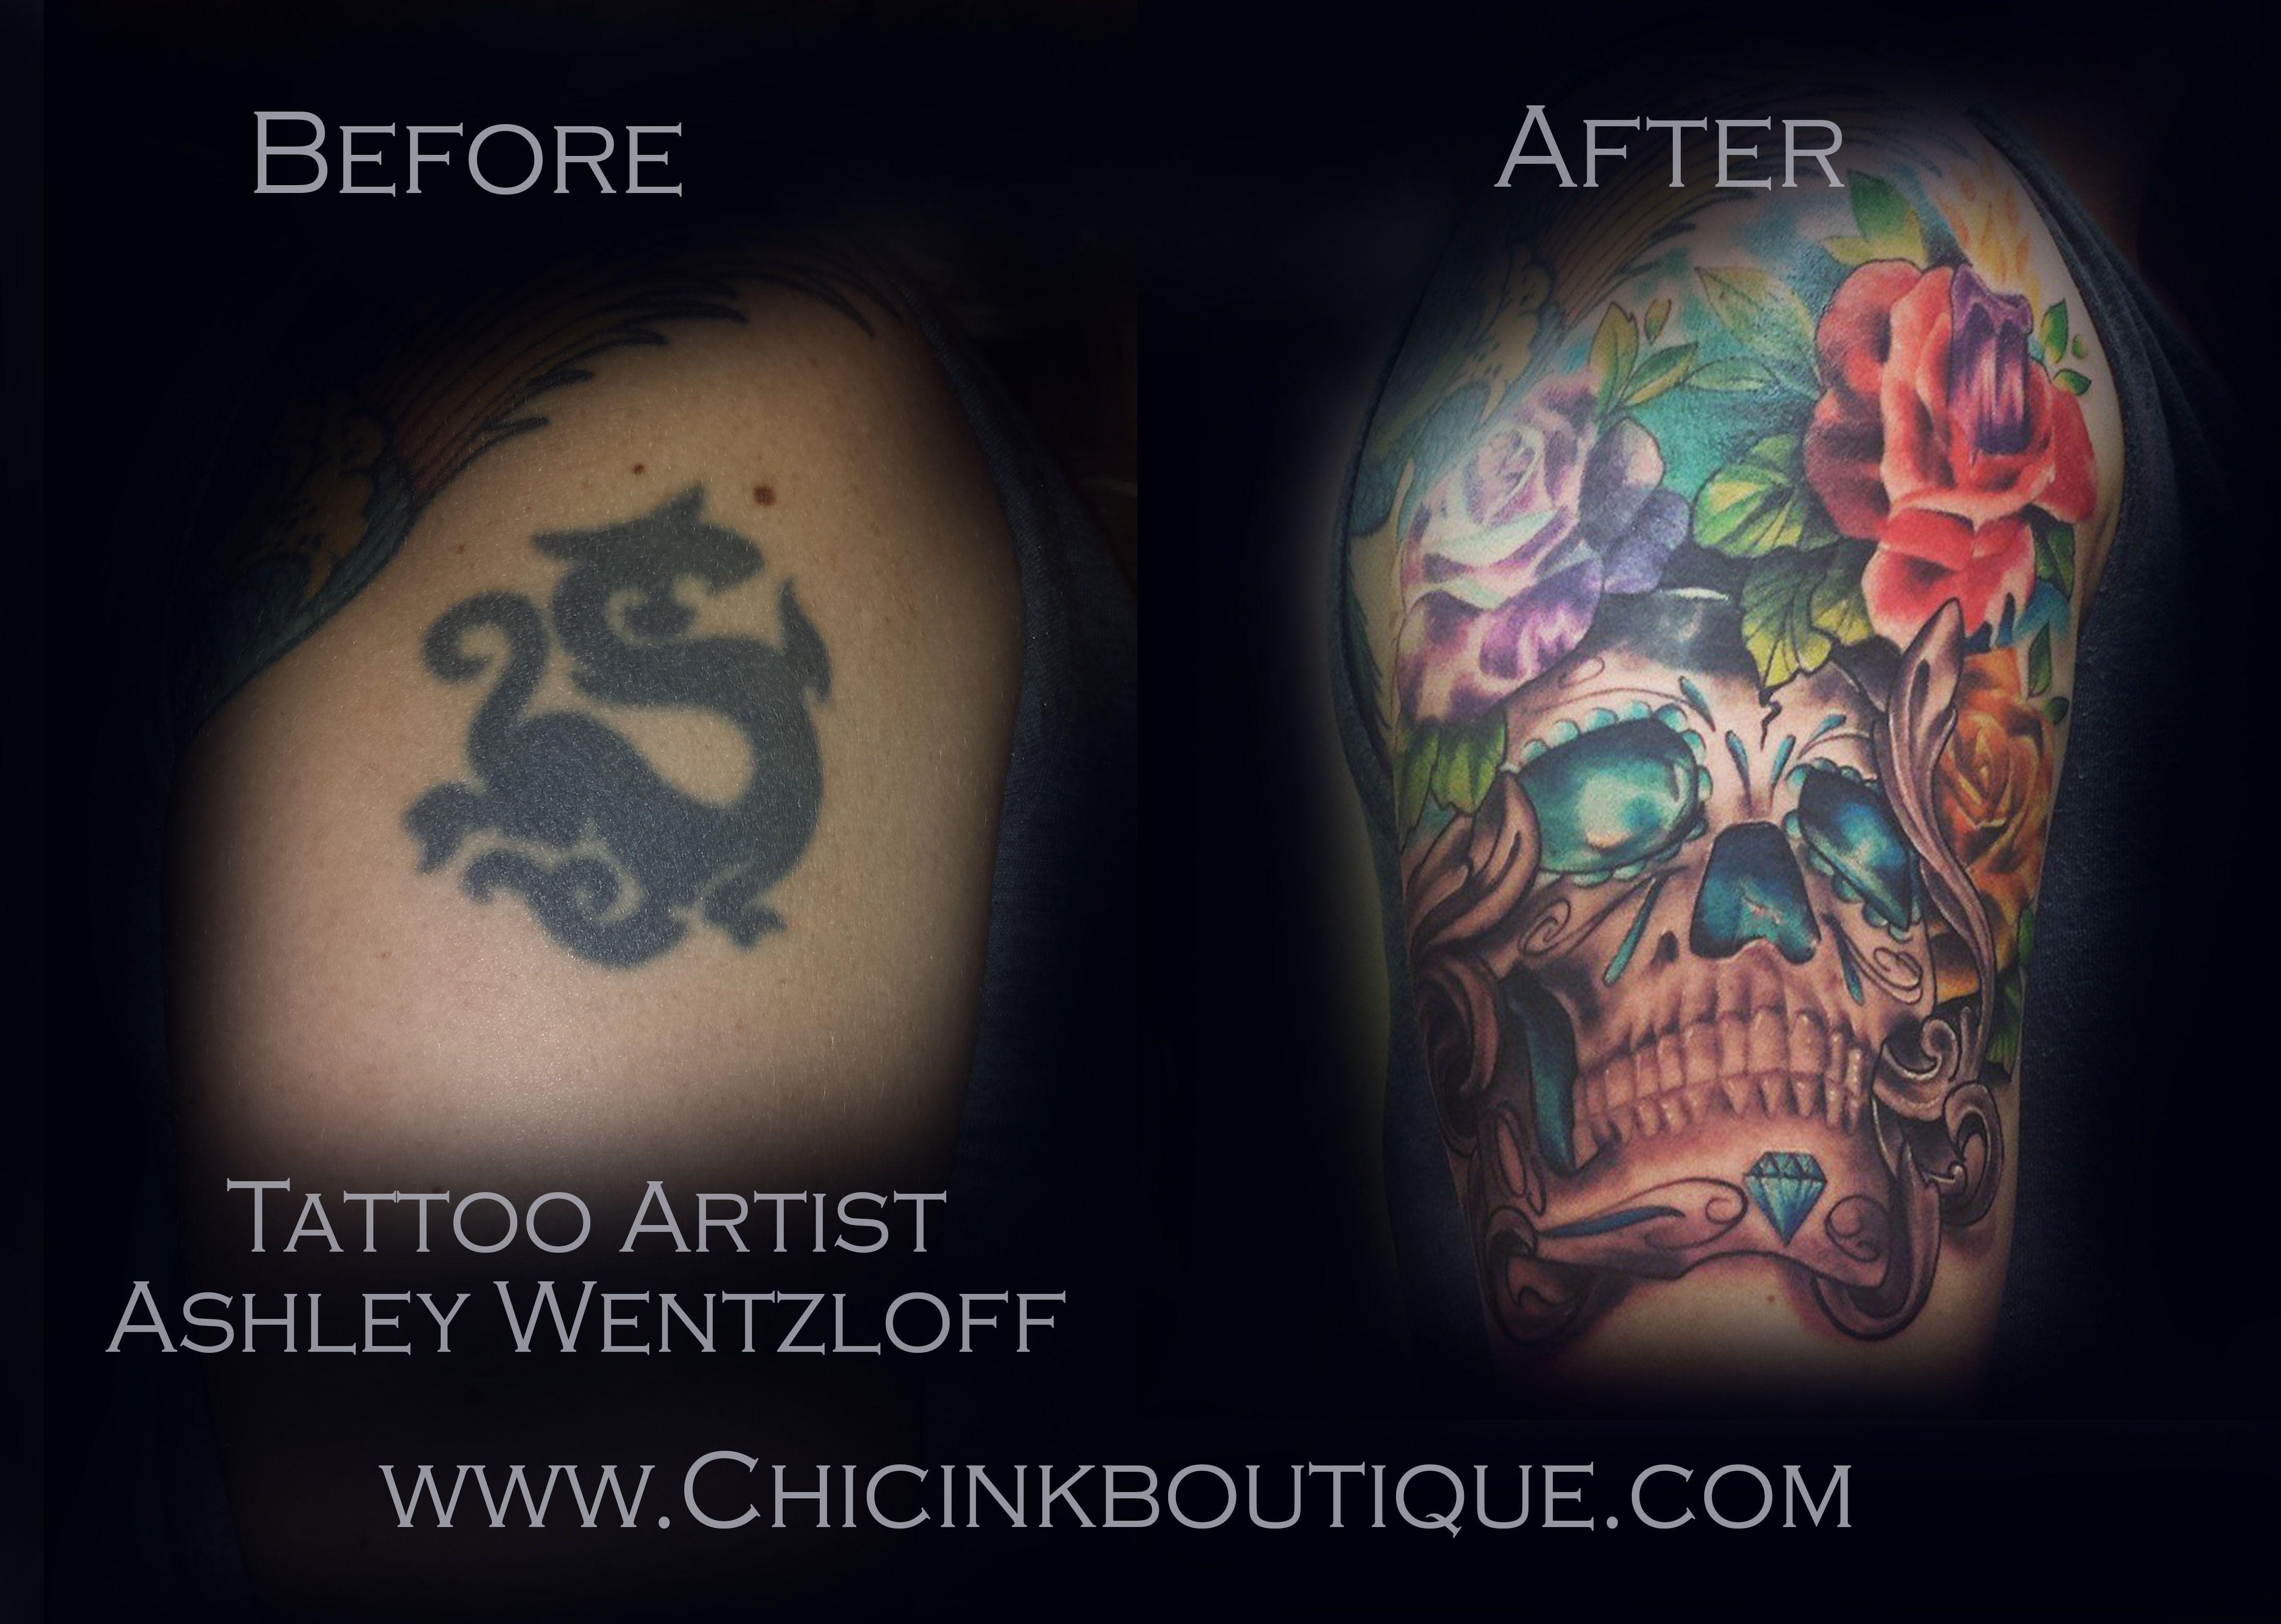 Great cover up tattoo ideas impressive cover up tattoo  chic inkus tattoo artist ashley